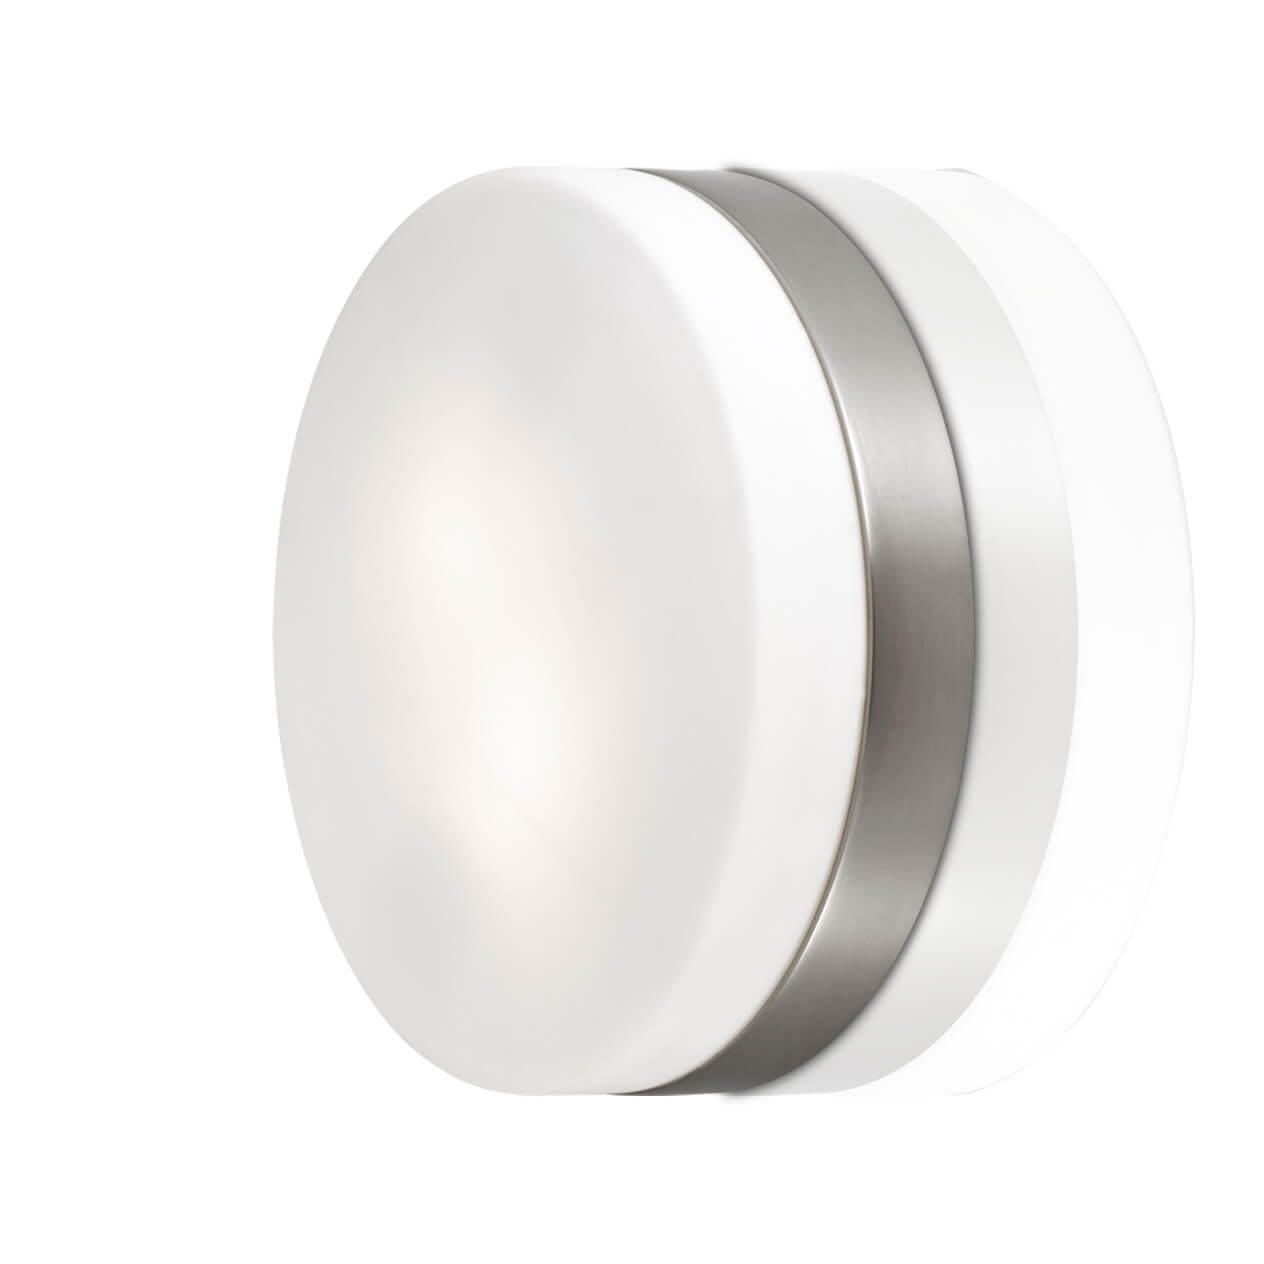 цена Светильник Odeon Light 2405/2C Drops онлайн в 2017 году